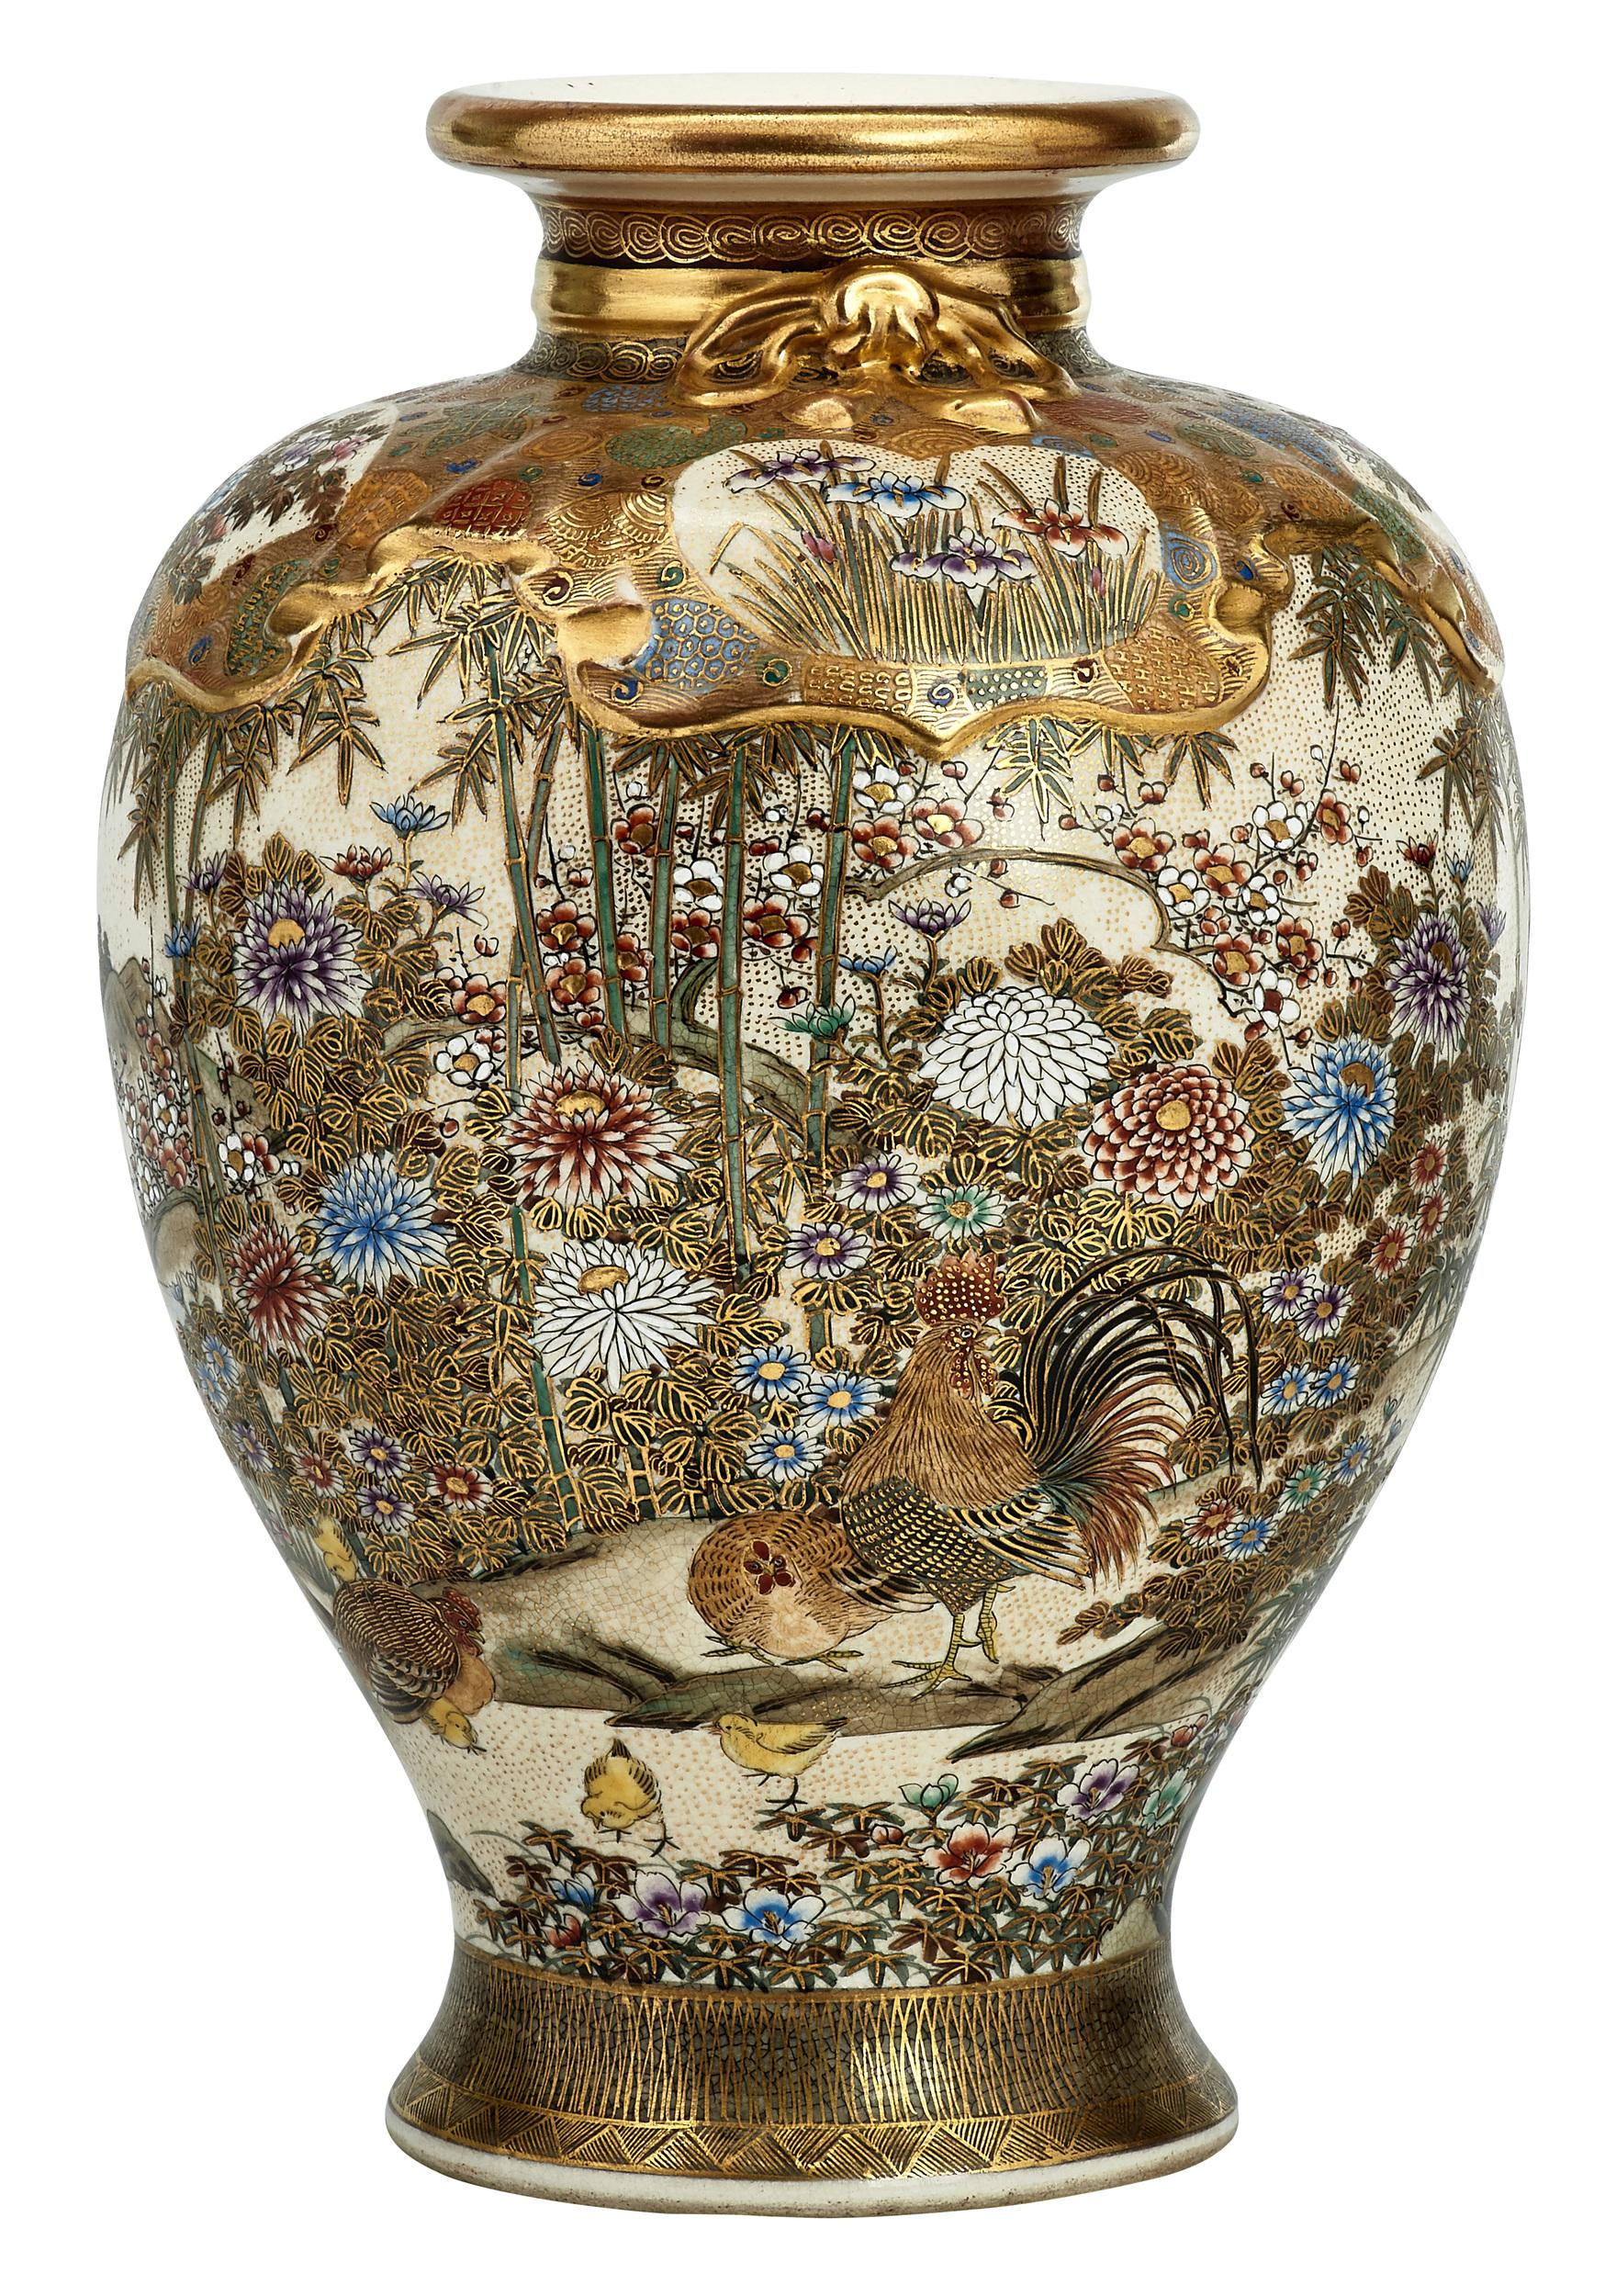 Satsuma vase | Treadway Gallery